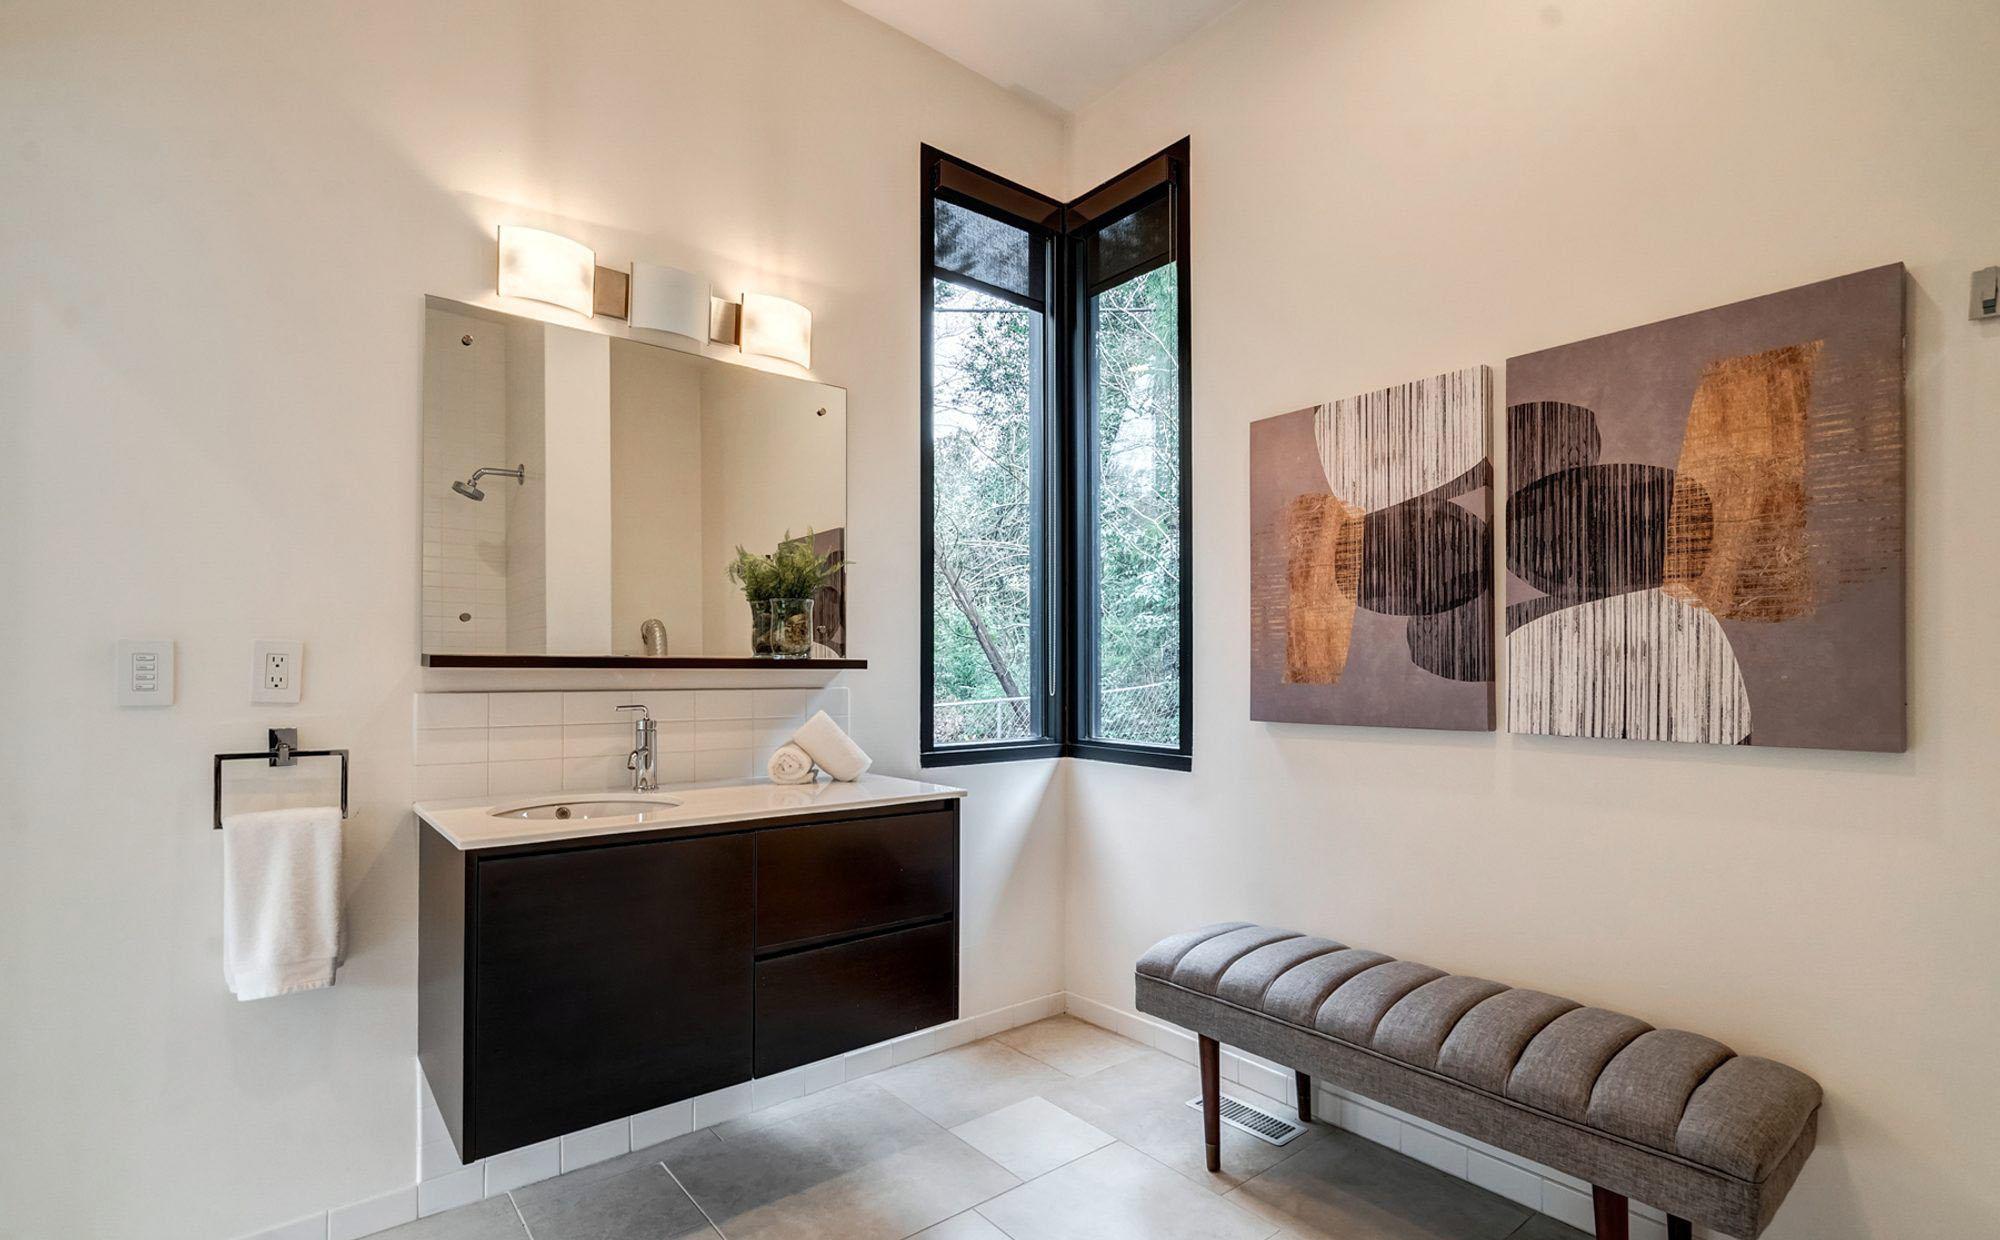 Modern bathroom with a tall and thin corner window.